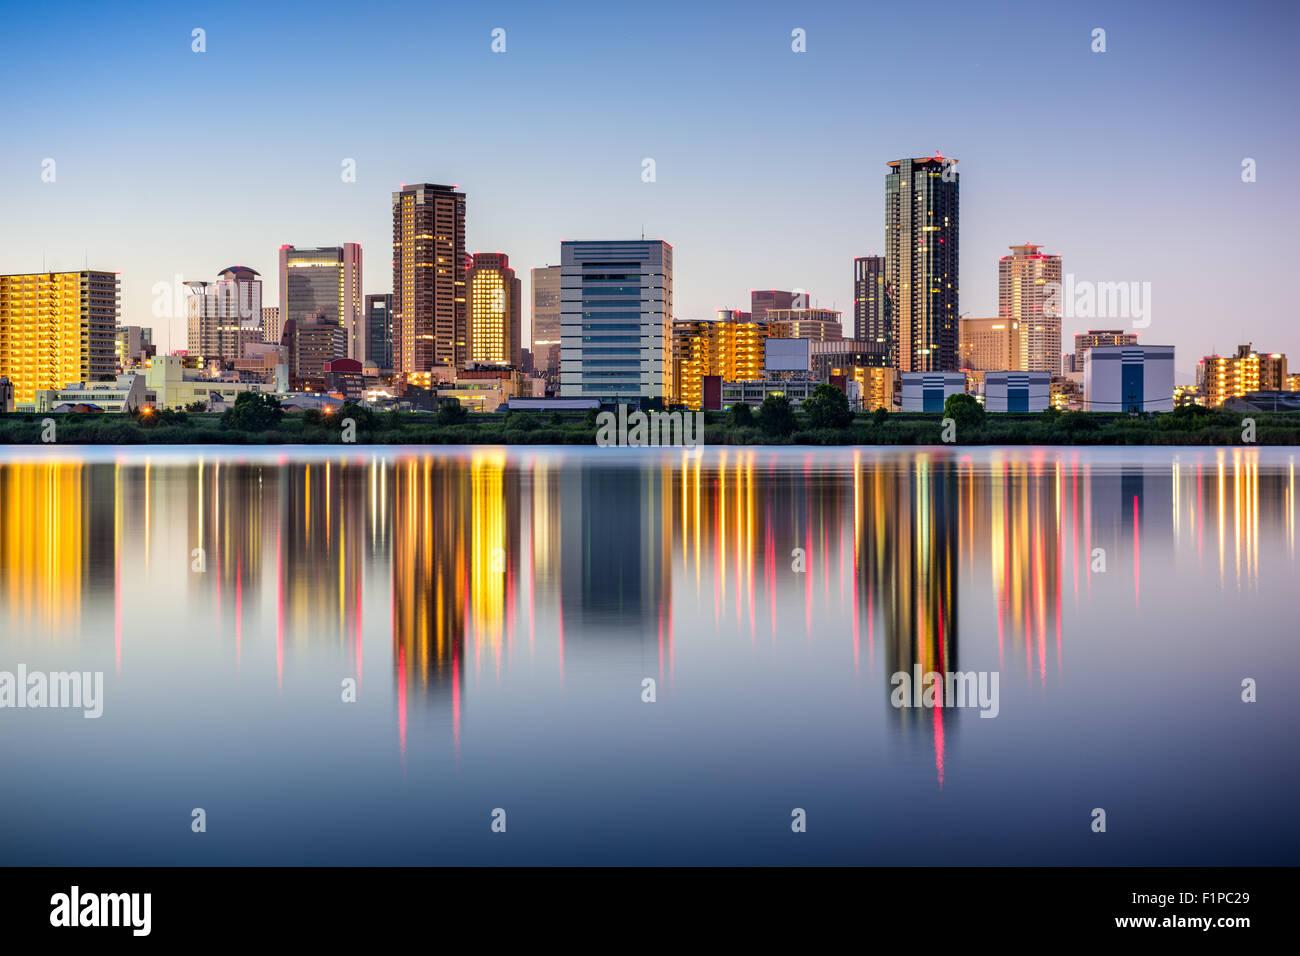 Osaka, Japan skyline at the Umeda District on the Yodogawa River. - Stock Image